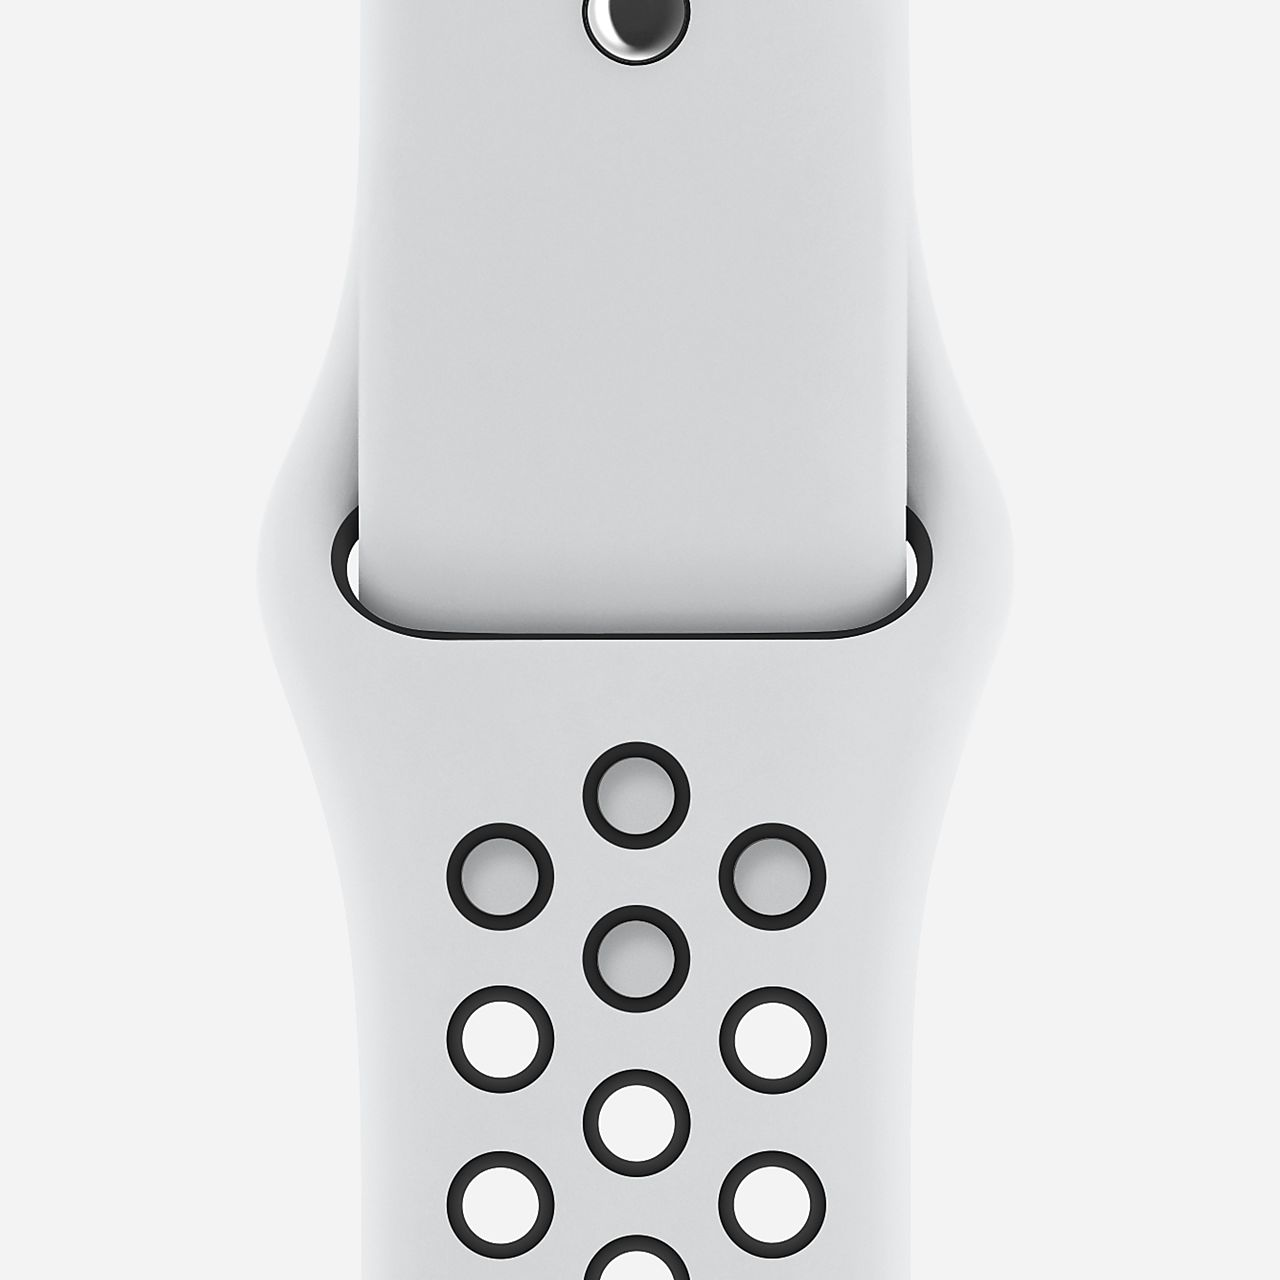 Correa deportiva para Apple Watch Nike+ de 42 mm